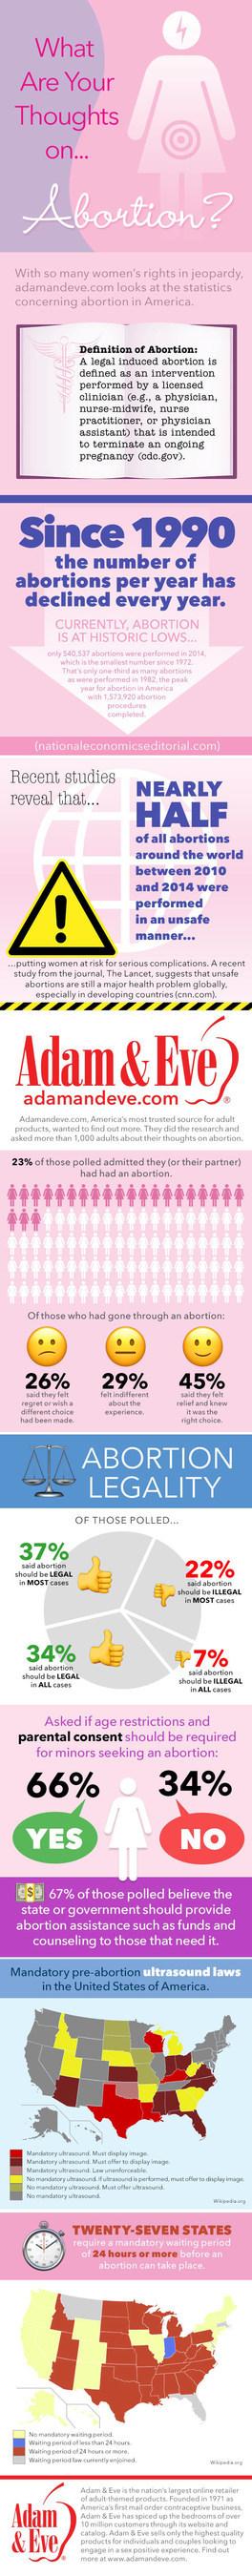 Adamandeve.com Reveals Statistics on Abortion